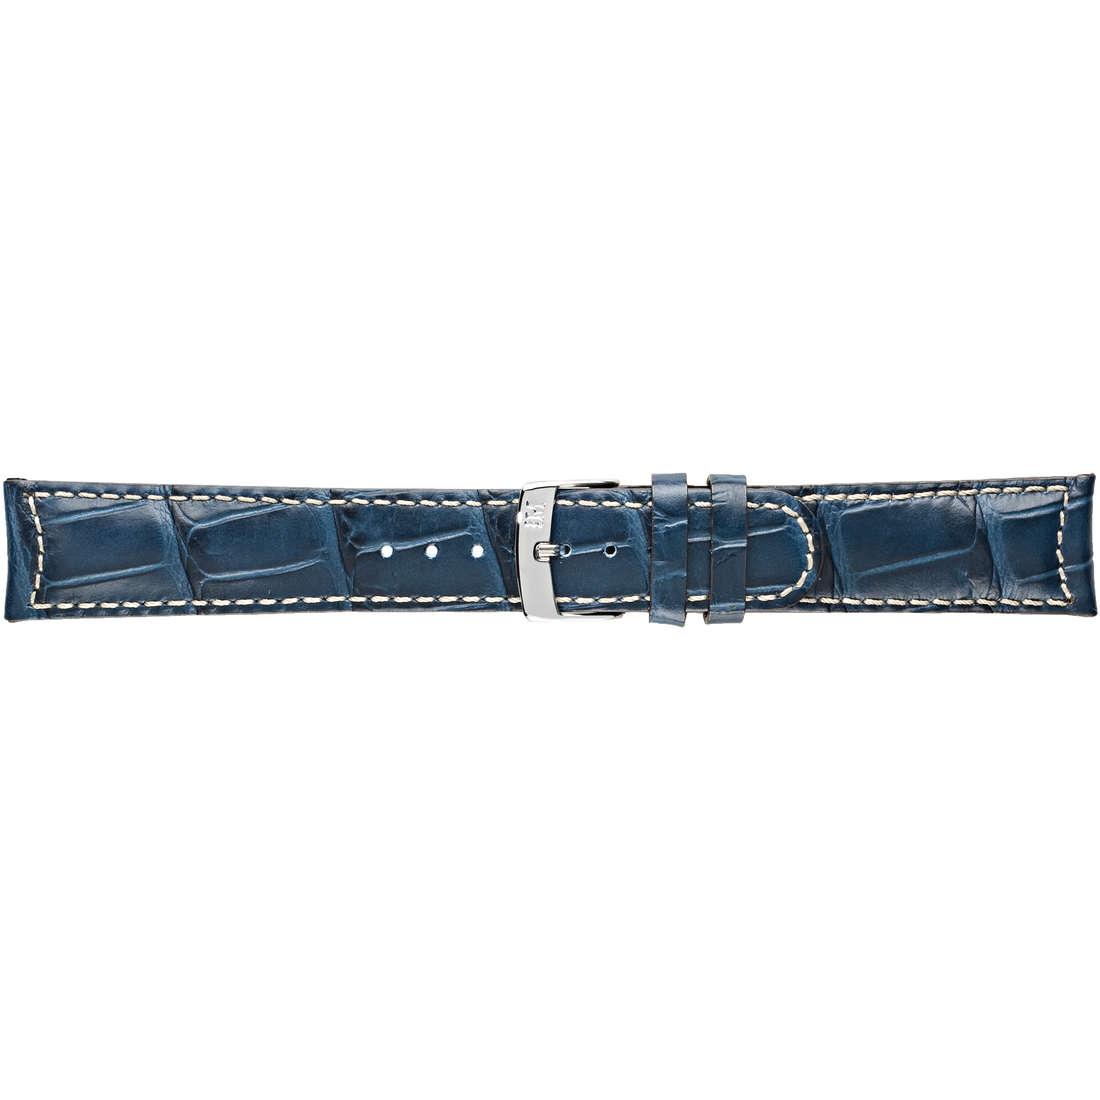 watch watch bands watch straps man Morellato Manufatti A01U3882A59064CR22